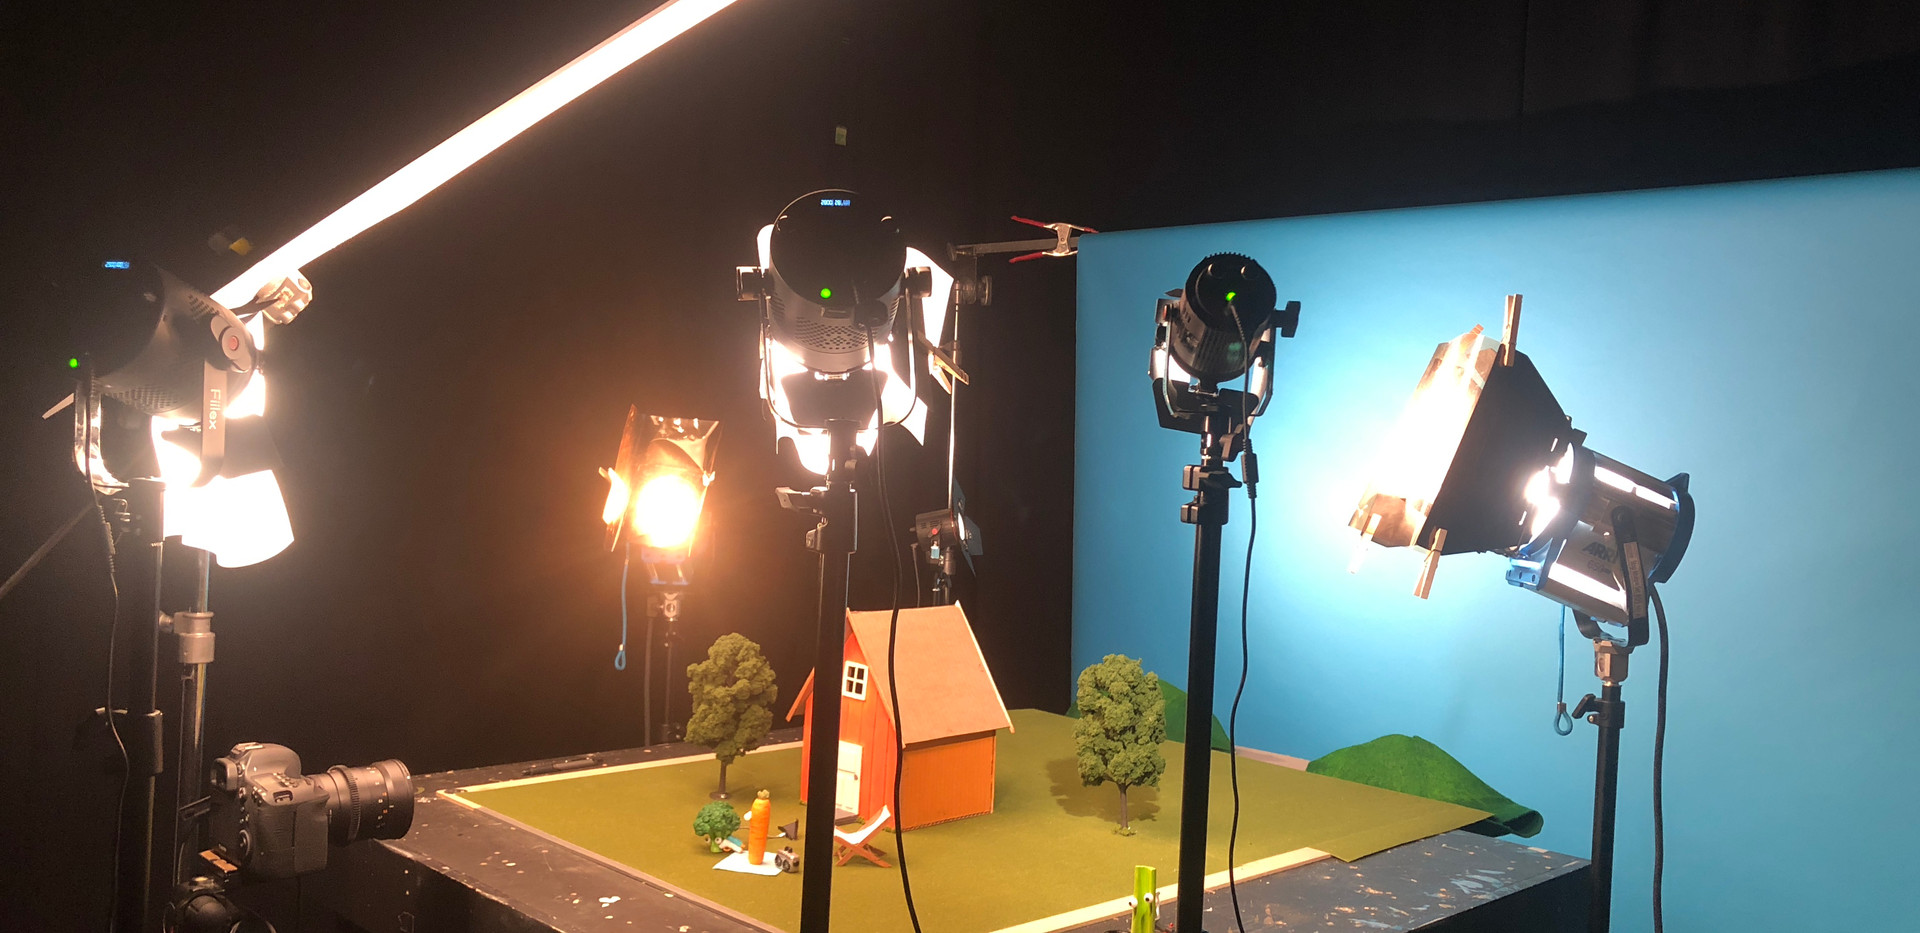 Lighting set up (six lights!)